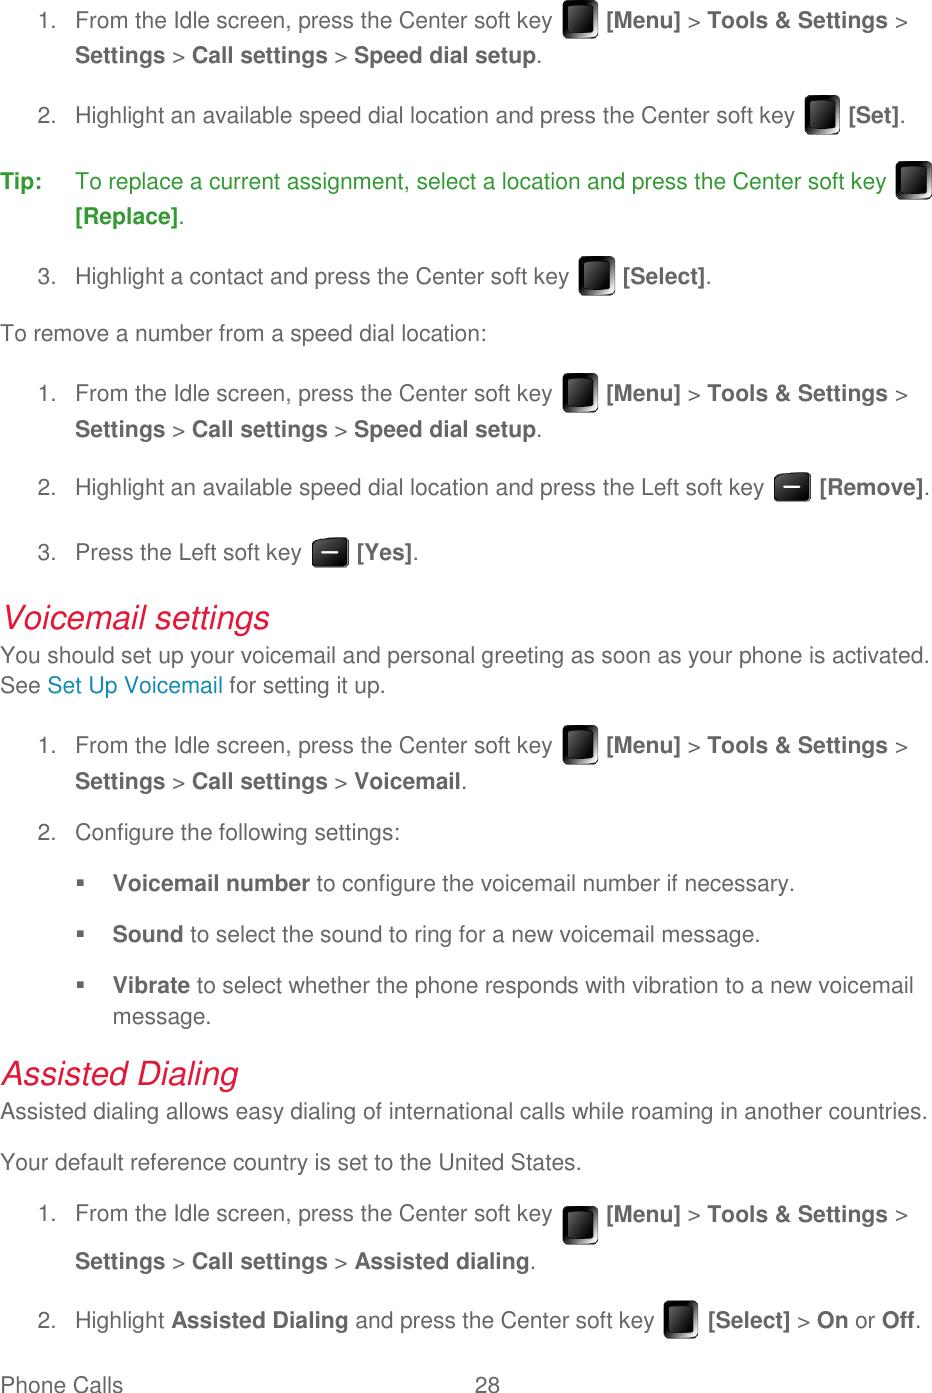 Kyocera 9530 user manual